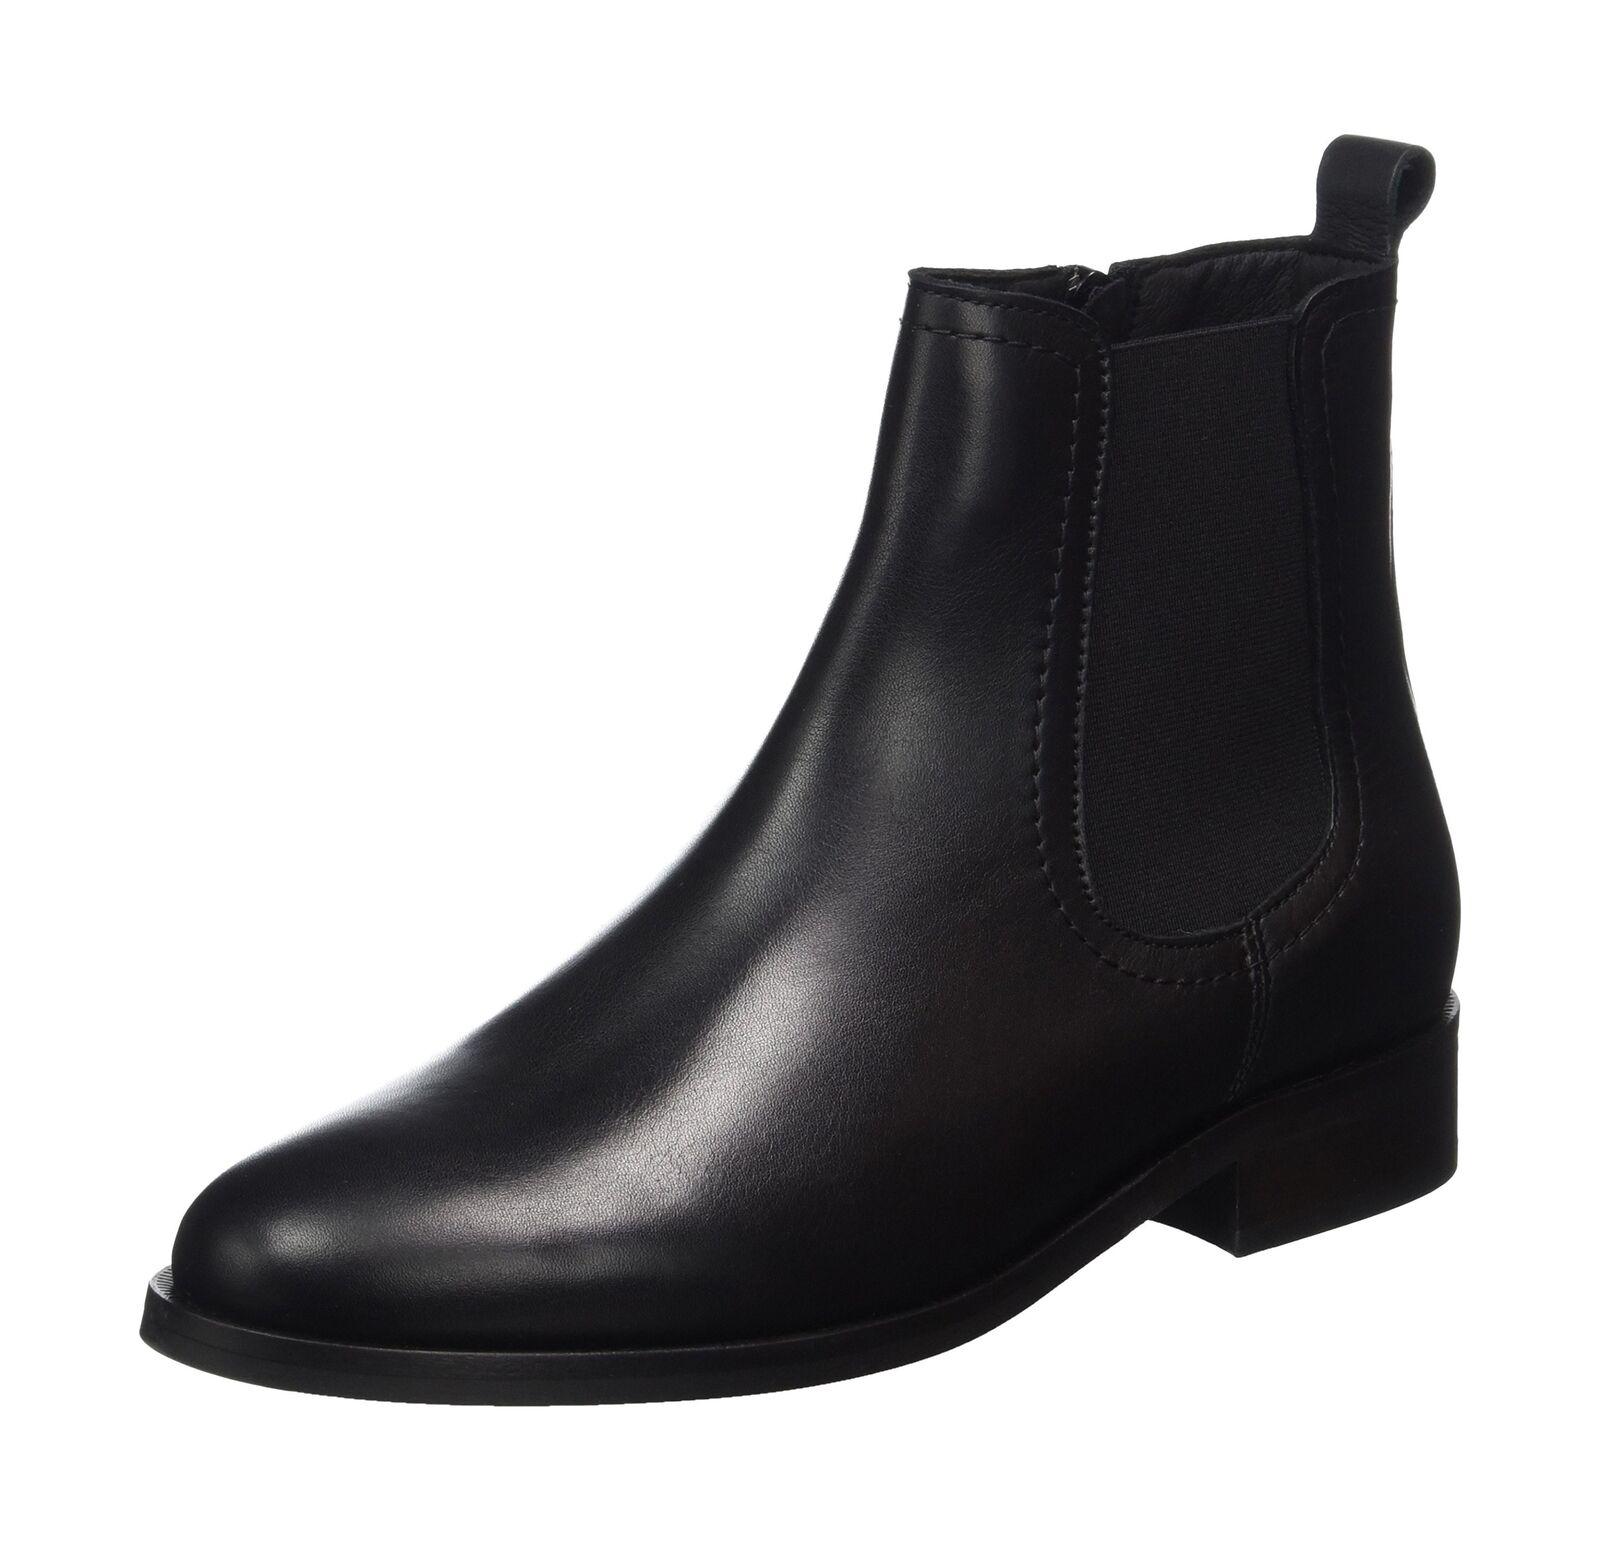 Buffalo Womens ES 30855l Sauvage Chelsea Boots Black Black Black (Preto 01 0) 6.5 UK 3adeff